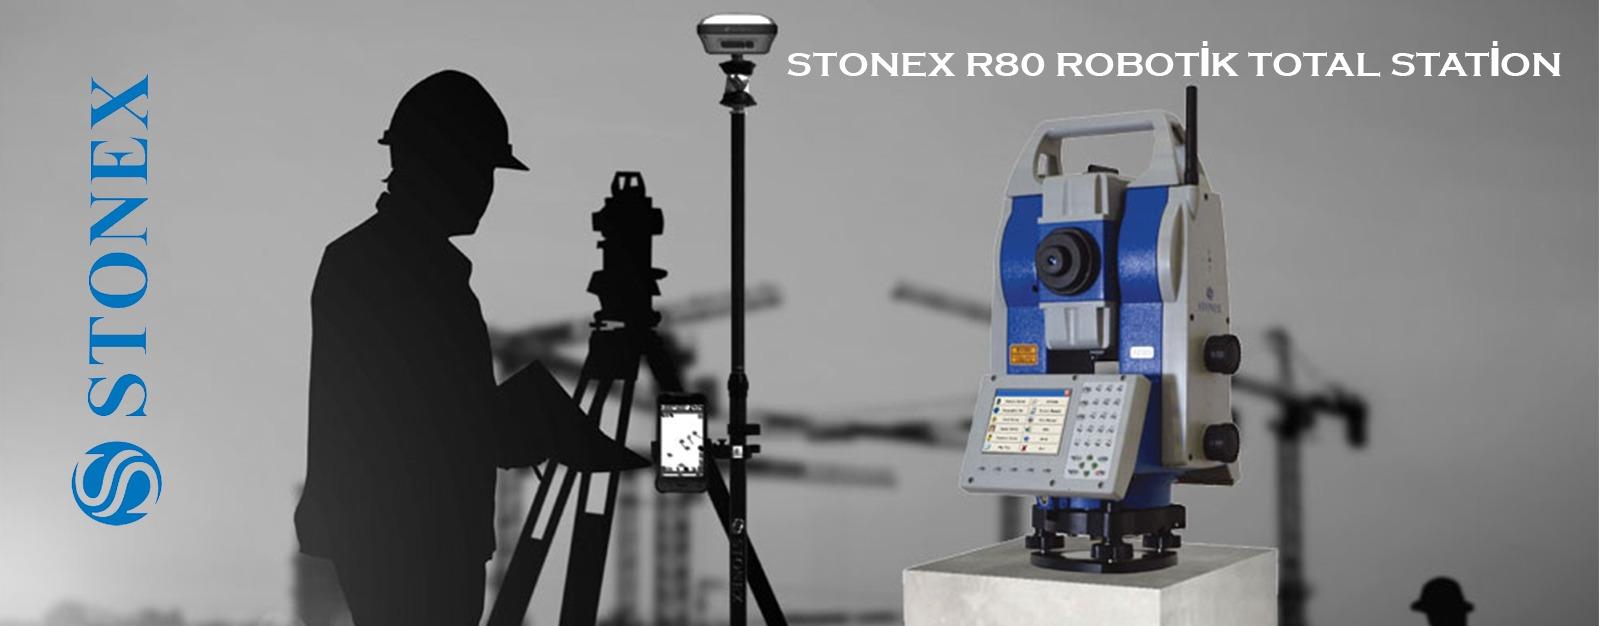 stonex-r80-banner